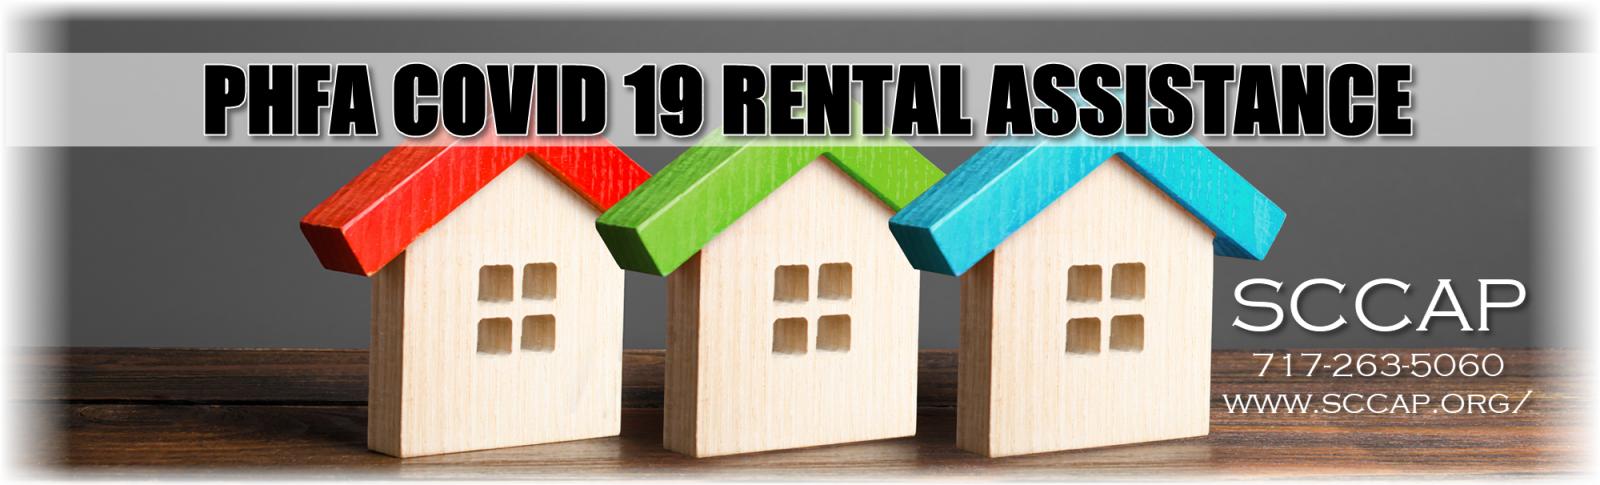 COVID Rental Assistance PHFA COVID-19 three houses